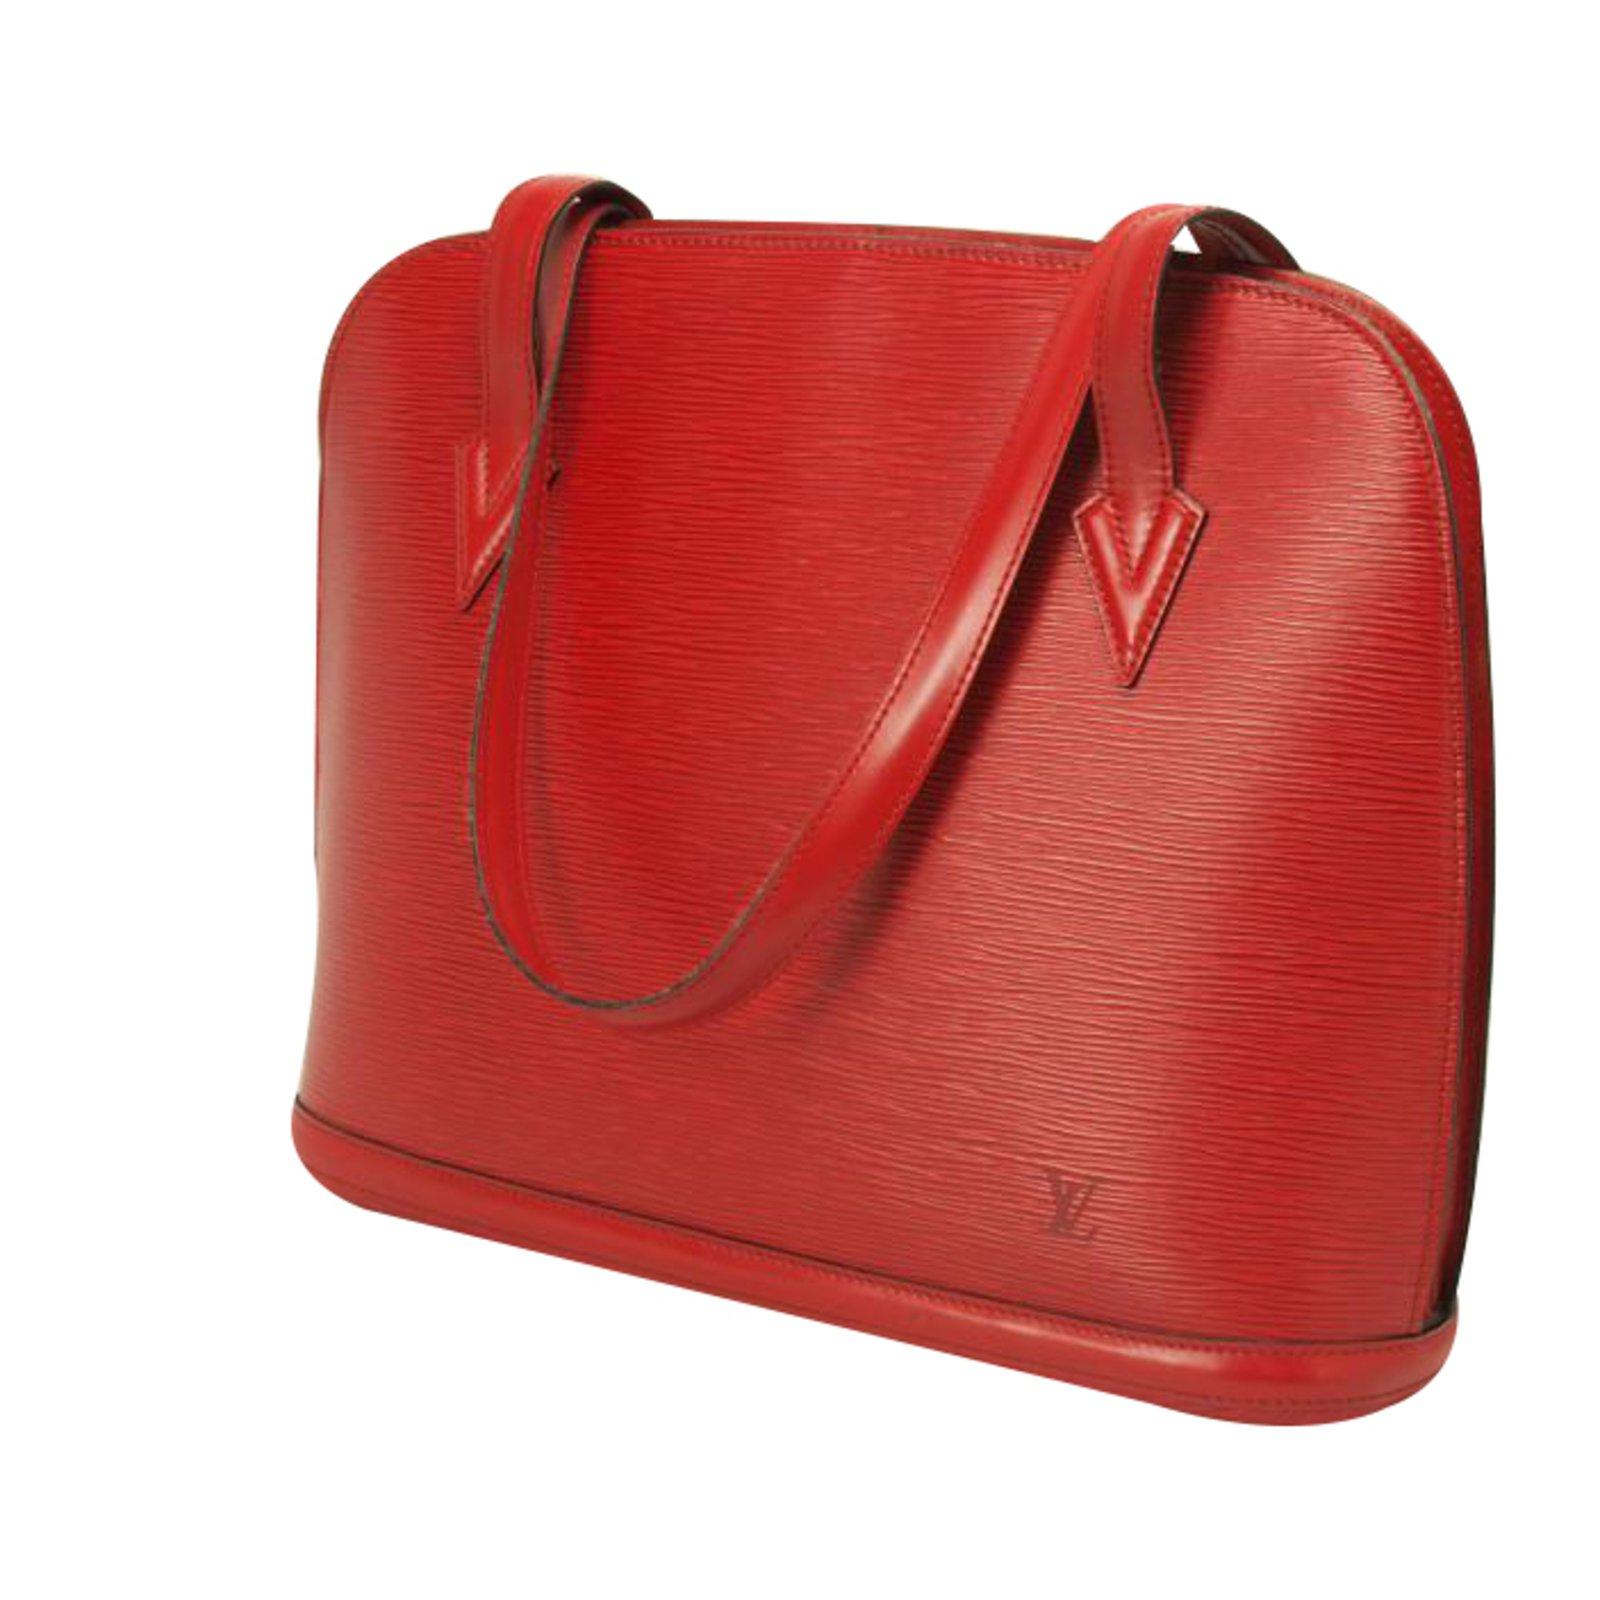 Sacs Main Louis Vuitton LUSSAC Cuir Rouge Ref33893